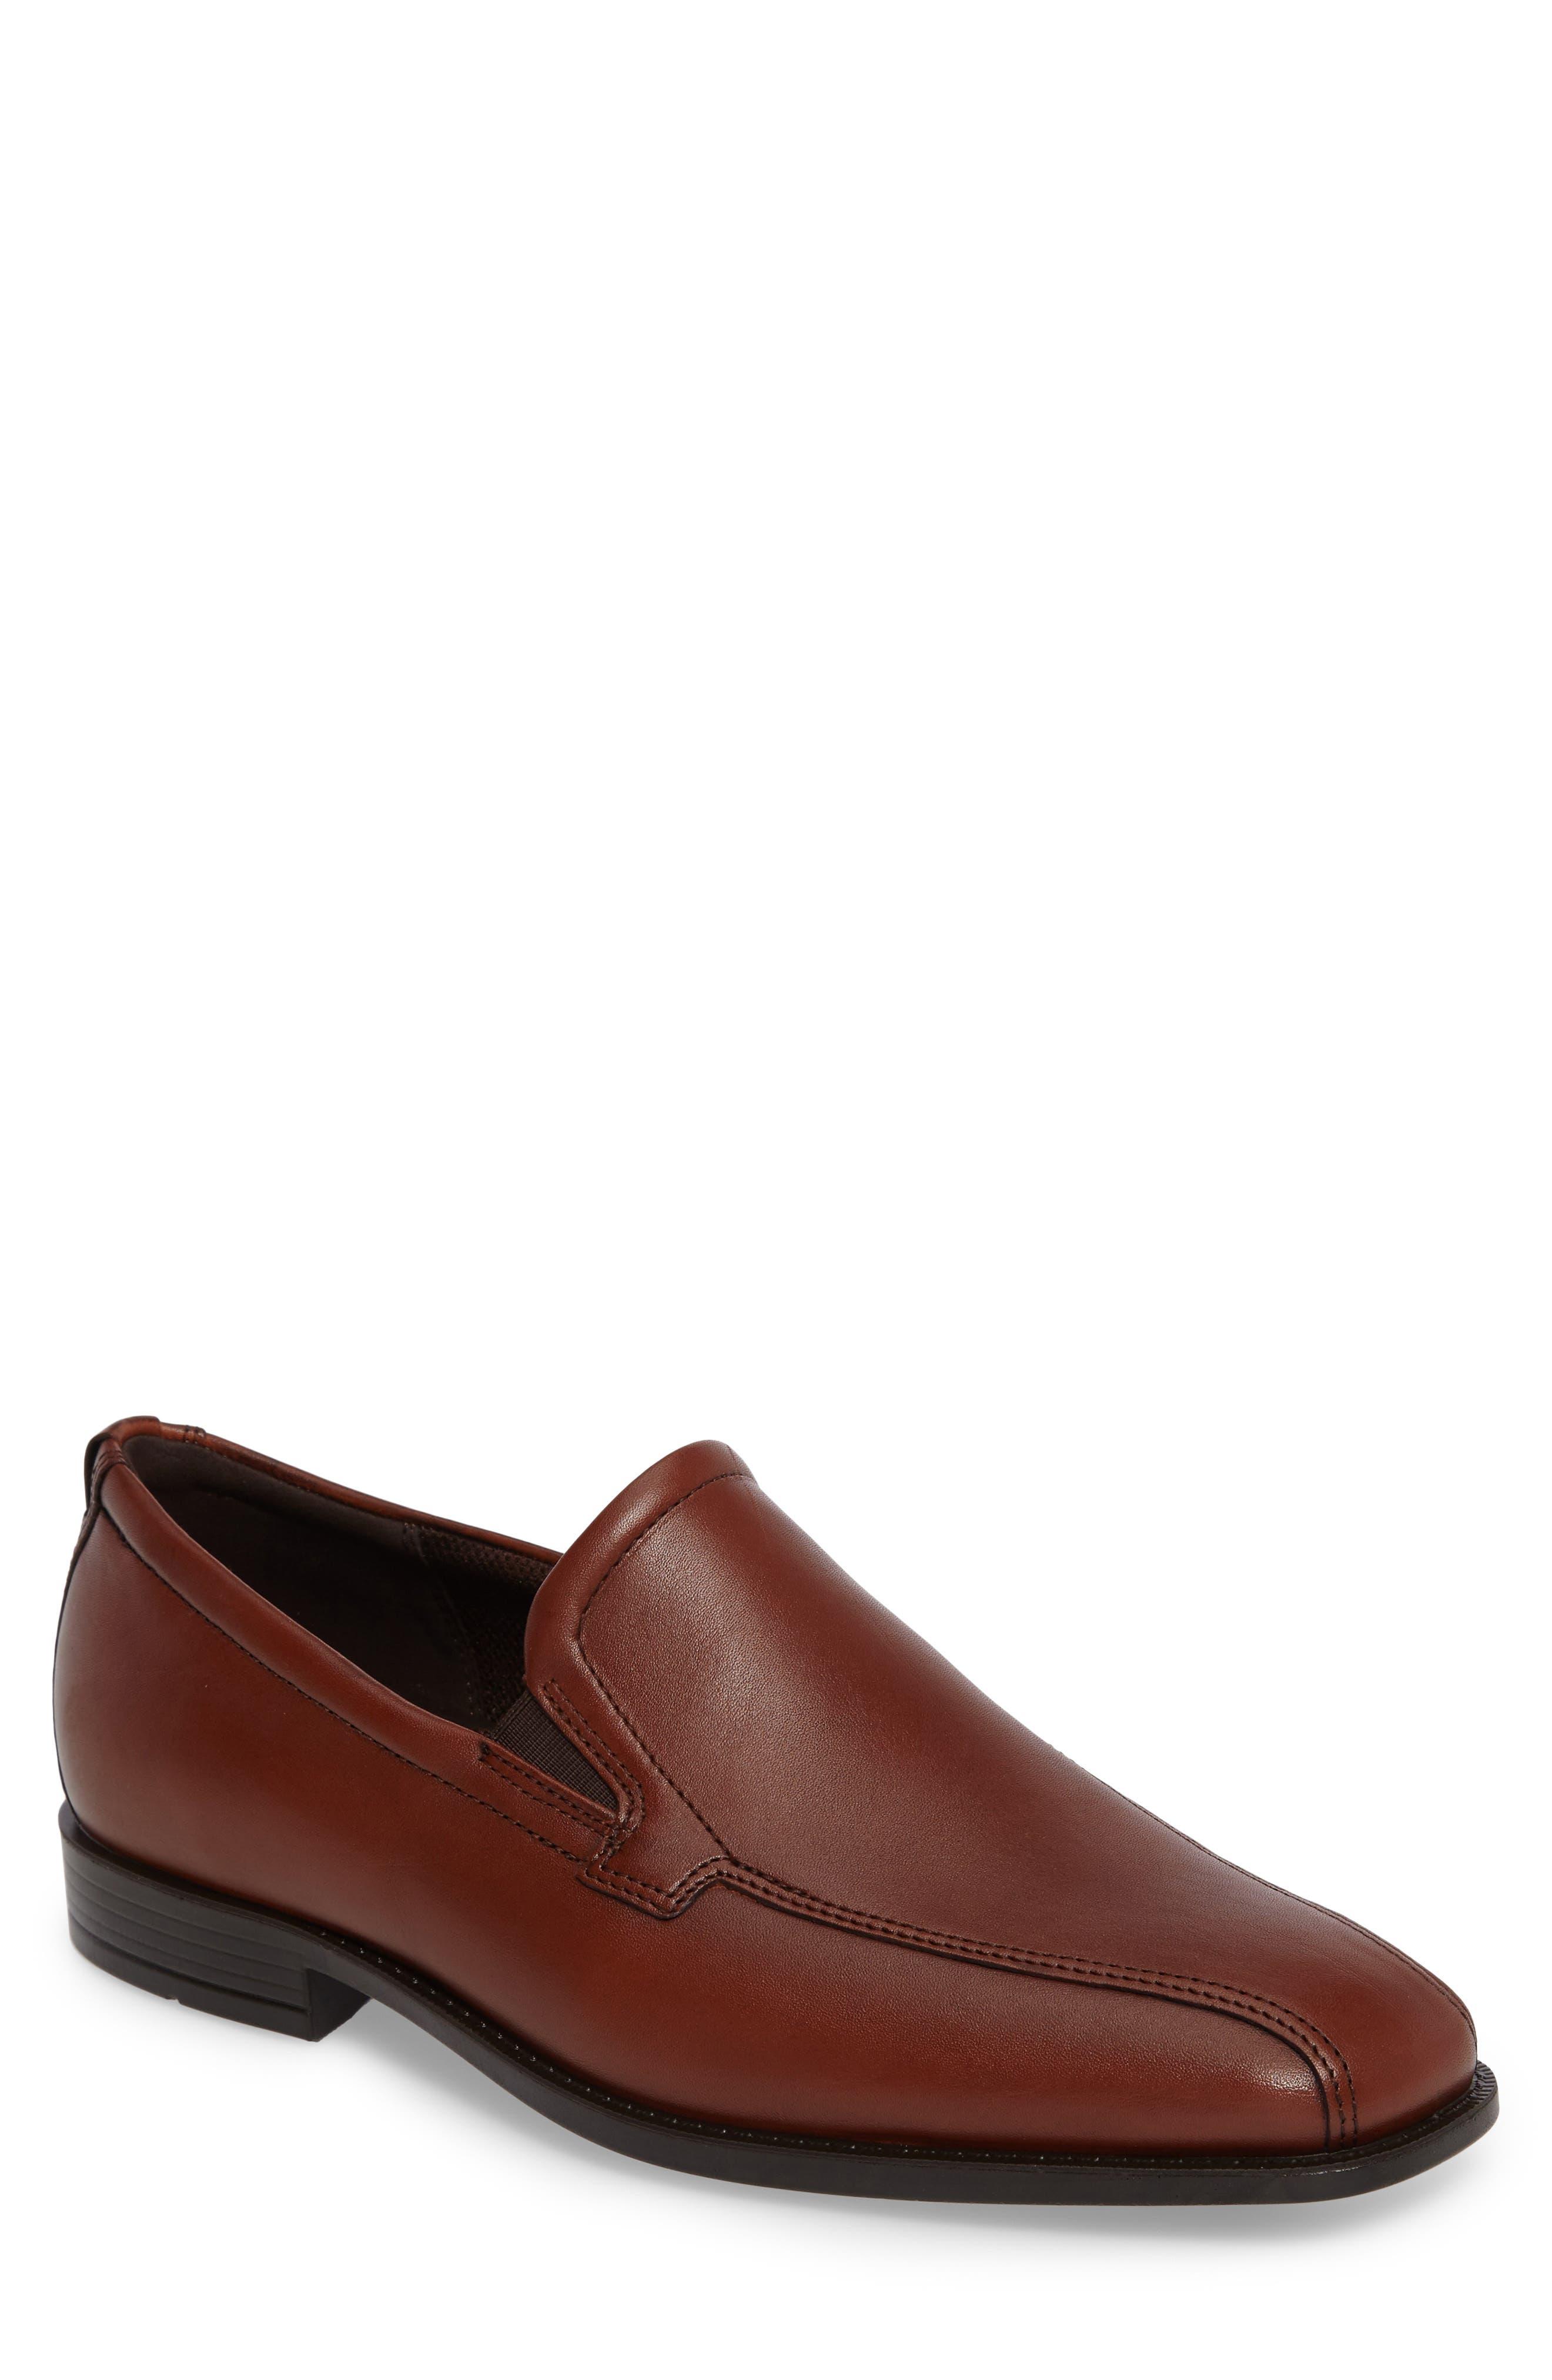 Edinburgh Venetian Loafer,                             Main thumbnail 1, color,                             Cognac Leather